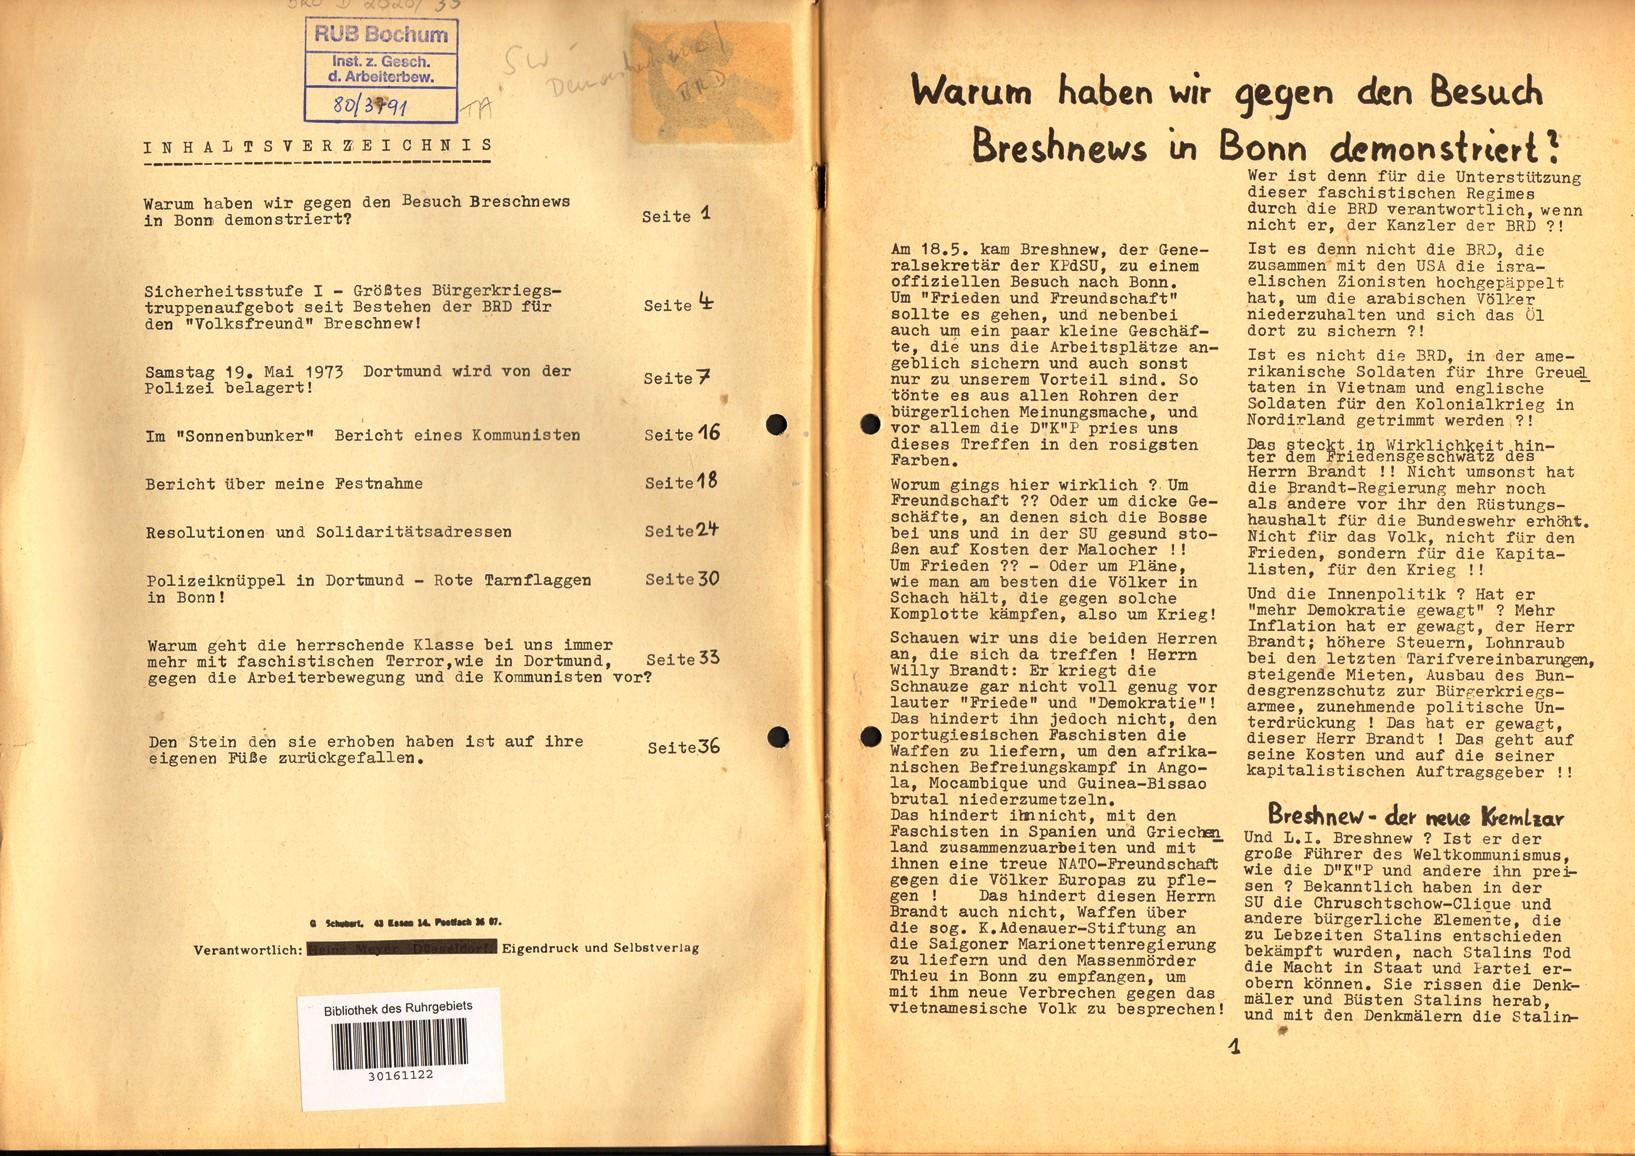 KPDML_1973_Breschnew_Besuch_in_Bonn_02